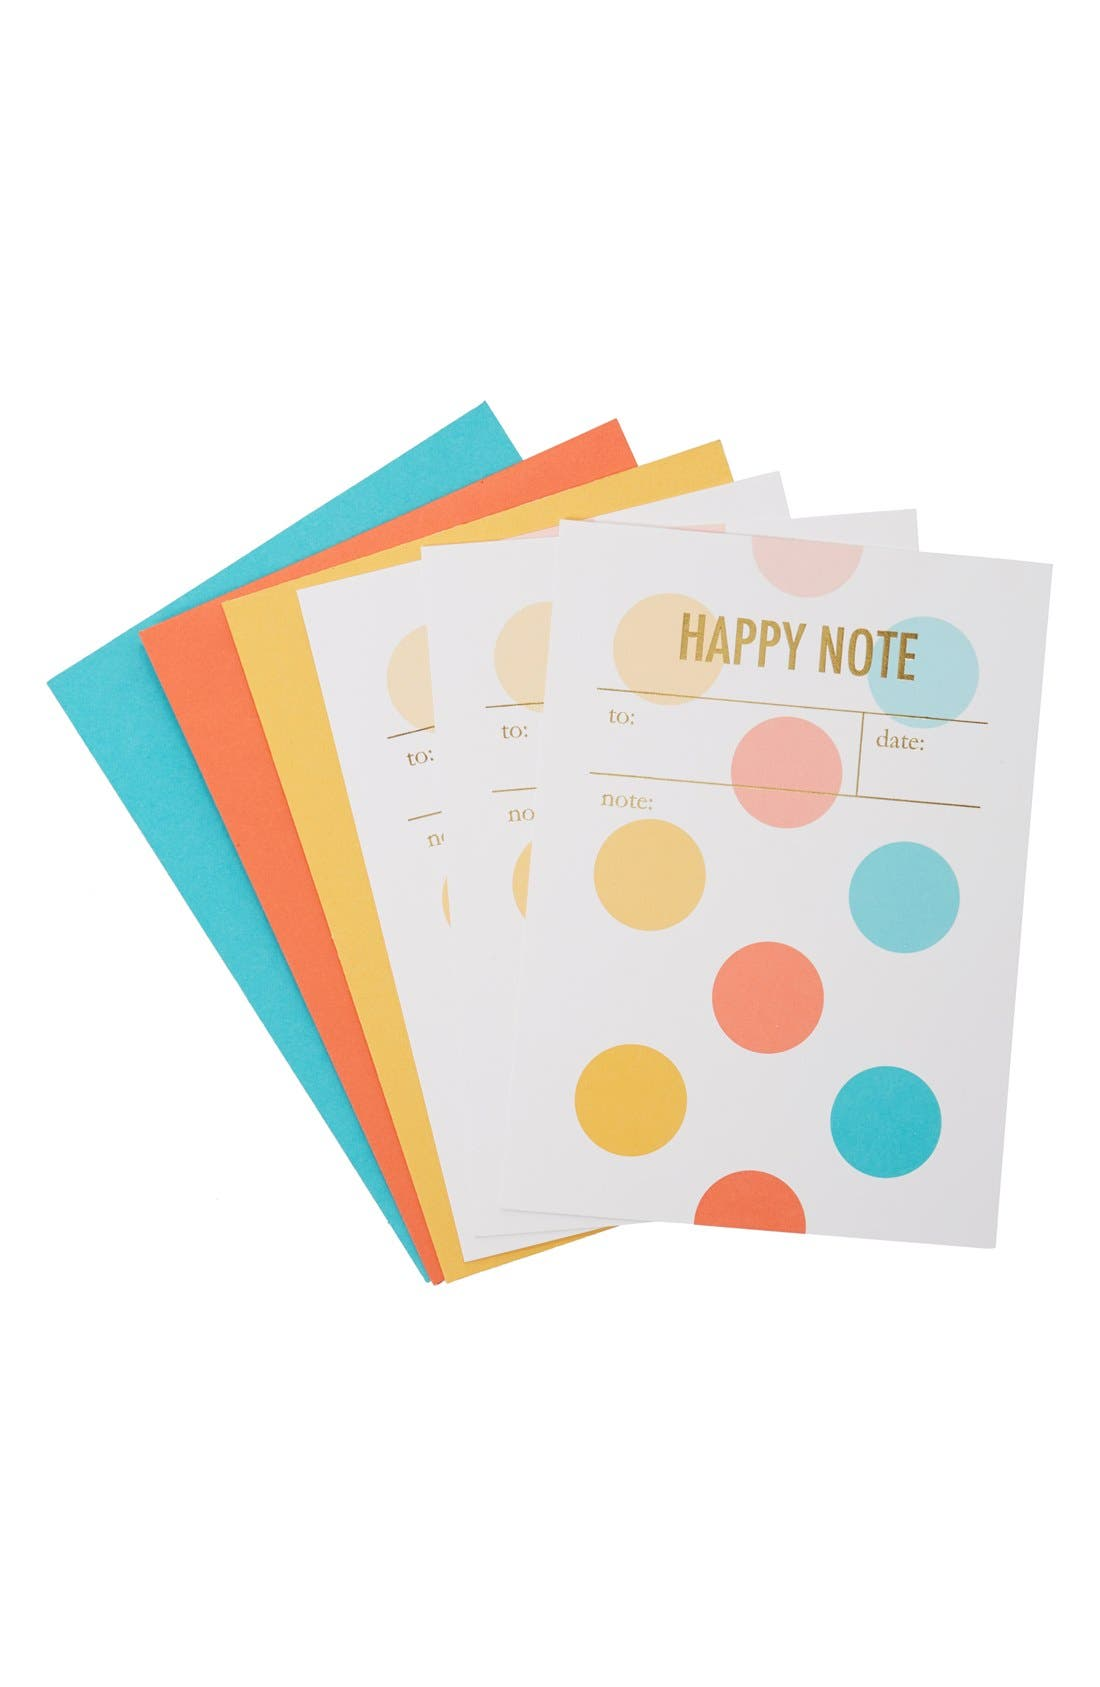 Alternate Image 1 Selected - Tokketok 'Happy Note' Letterpress Cards & Envelopes (Set of 3)